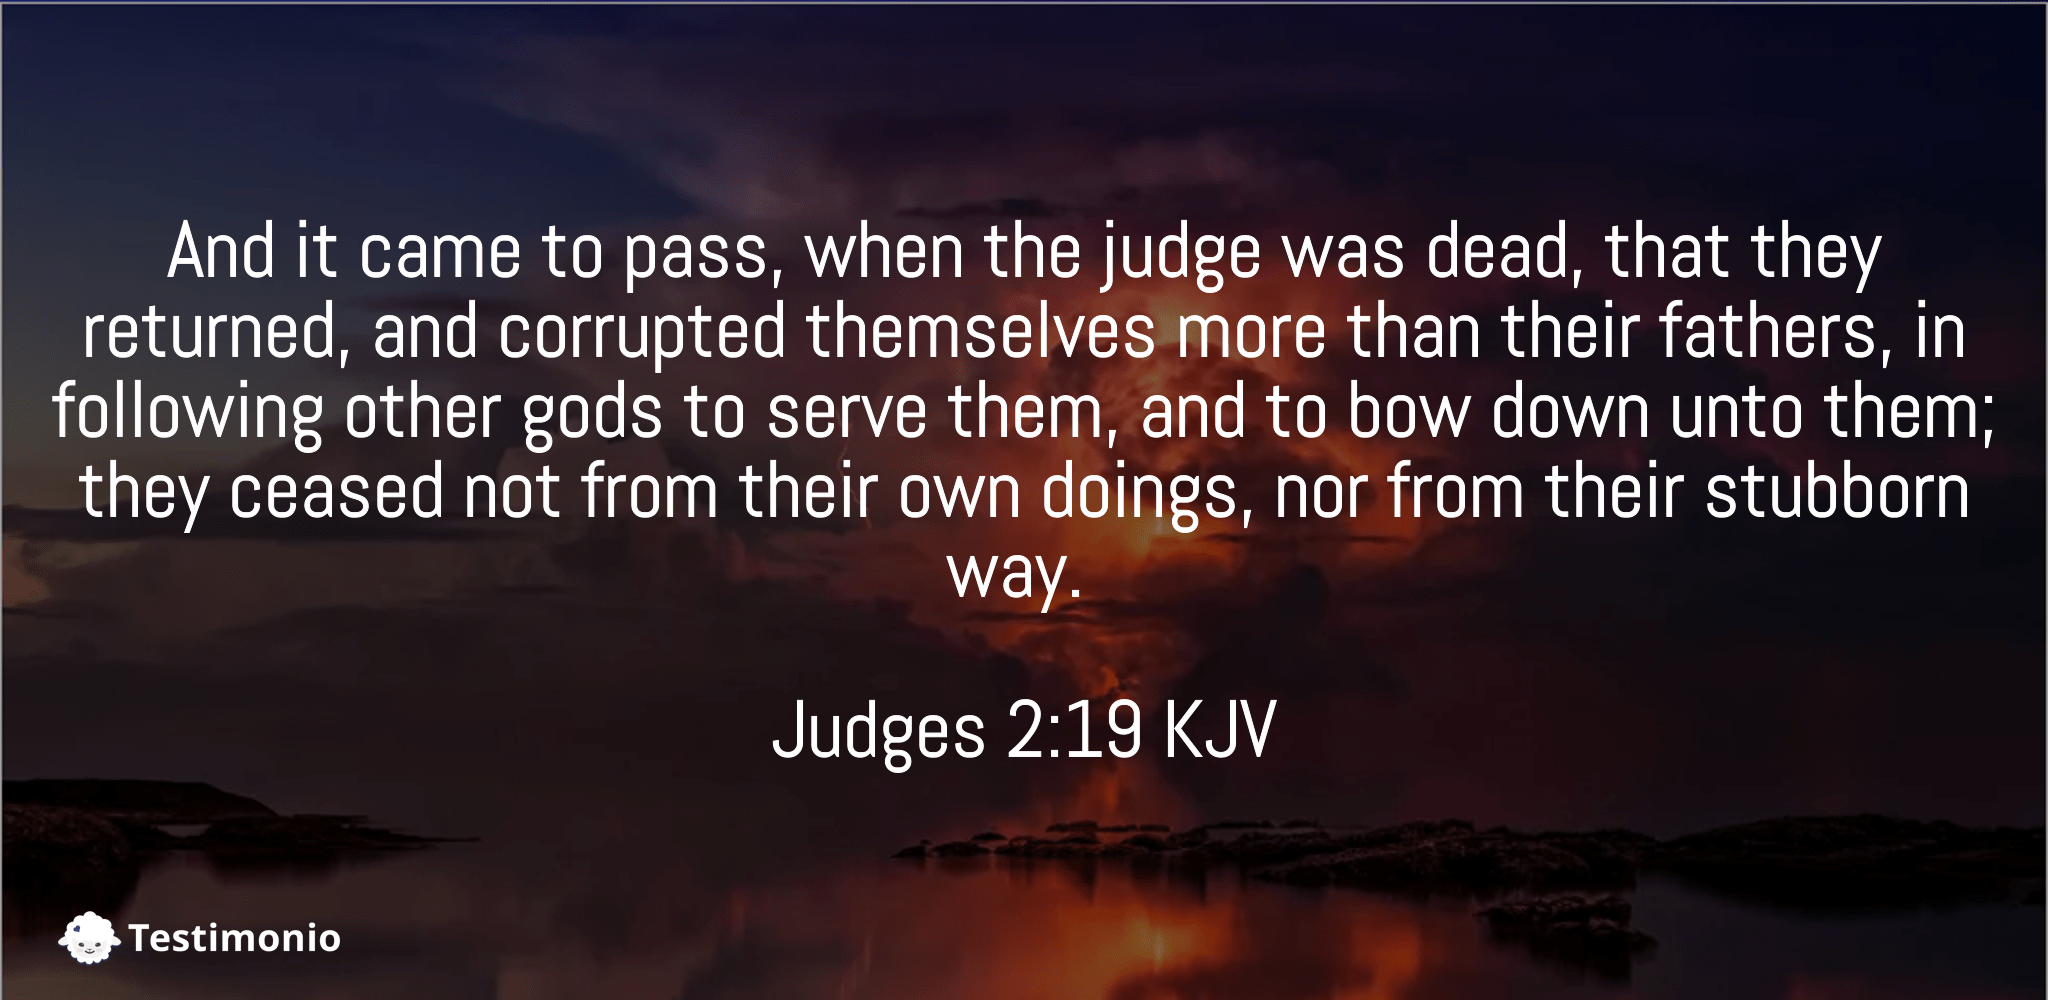 Judges 2:19